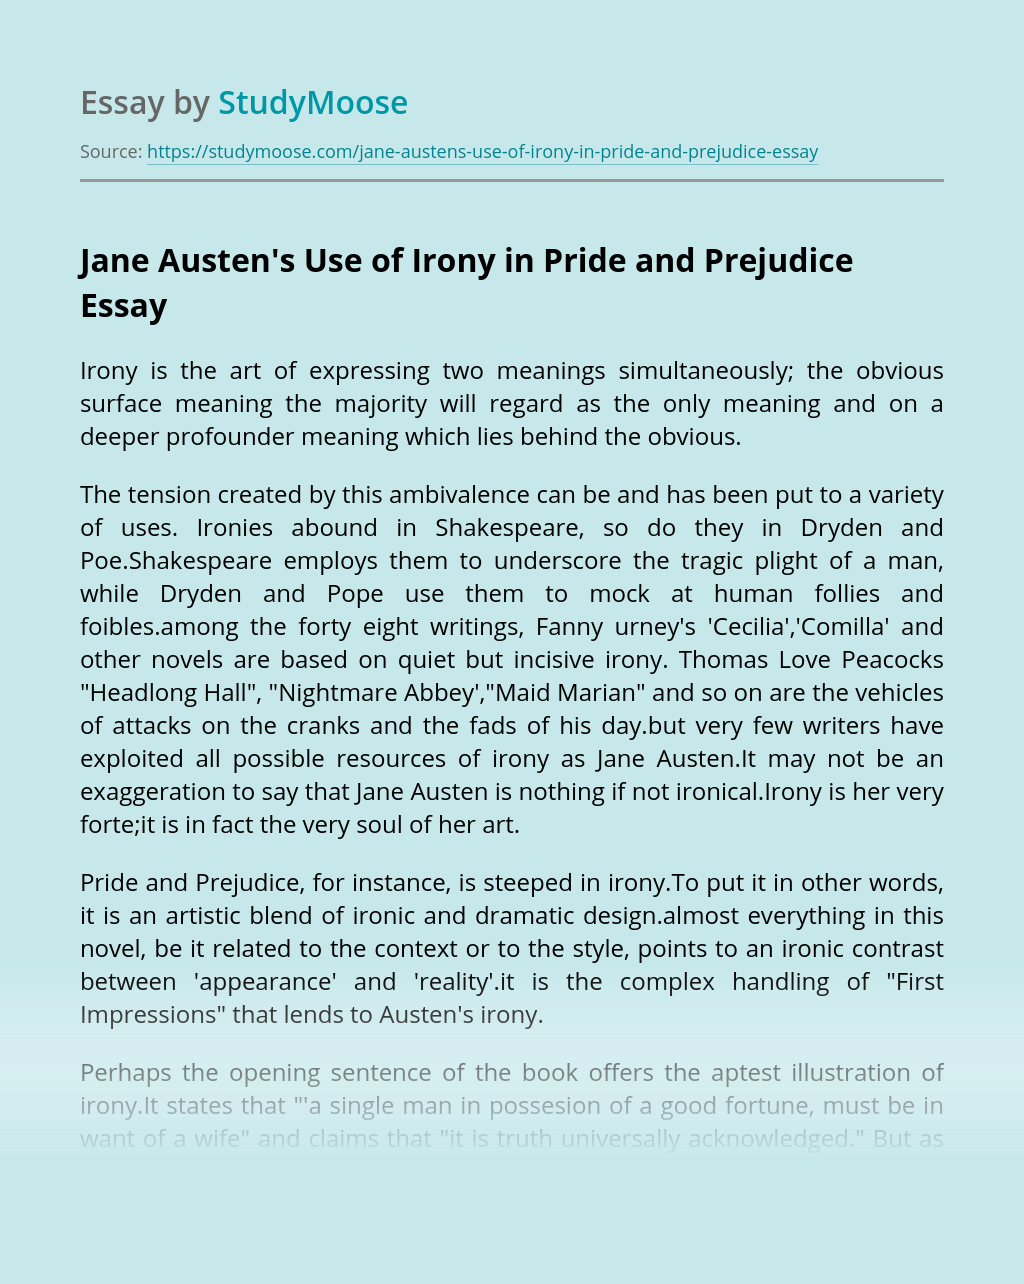 Jane Austen's Use of Irony in Pride and Prejudice